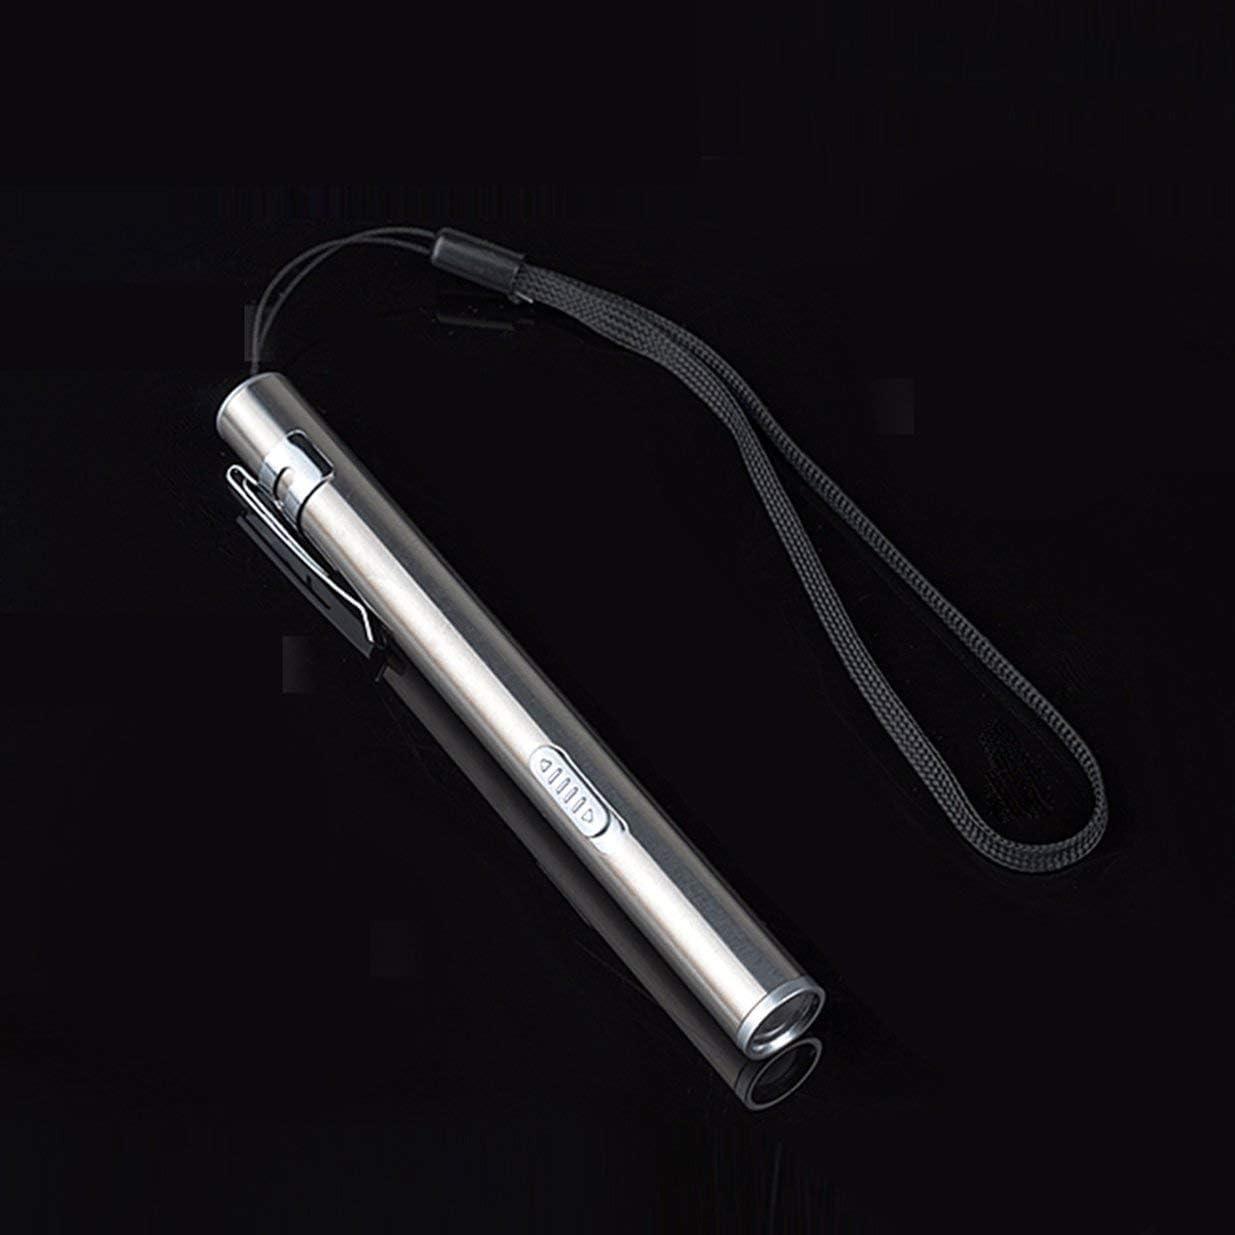 Sairis Mini Impermeable de Acero Inoxidable Potente Linterna LED Linterna port/átil Recargable